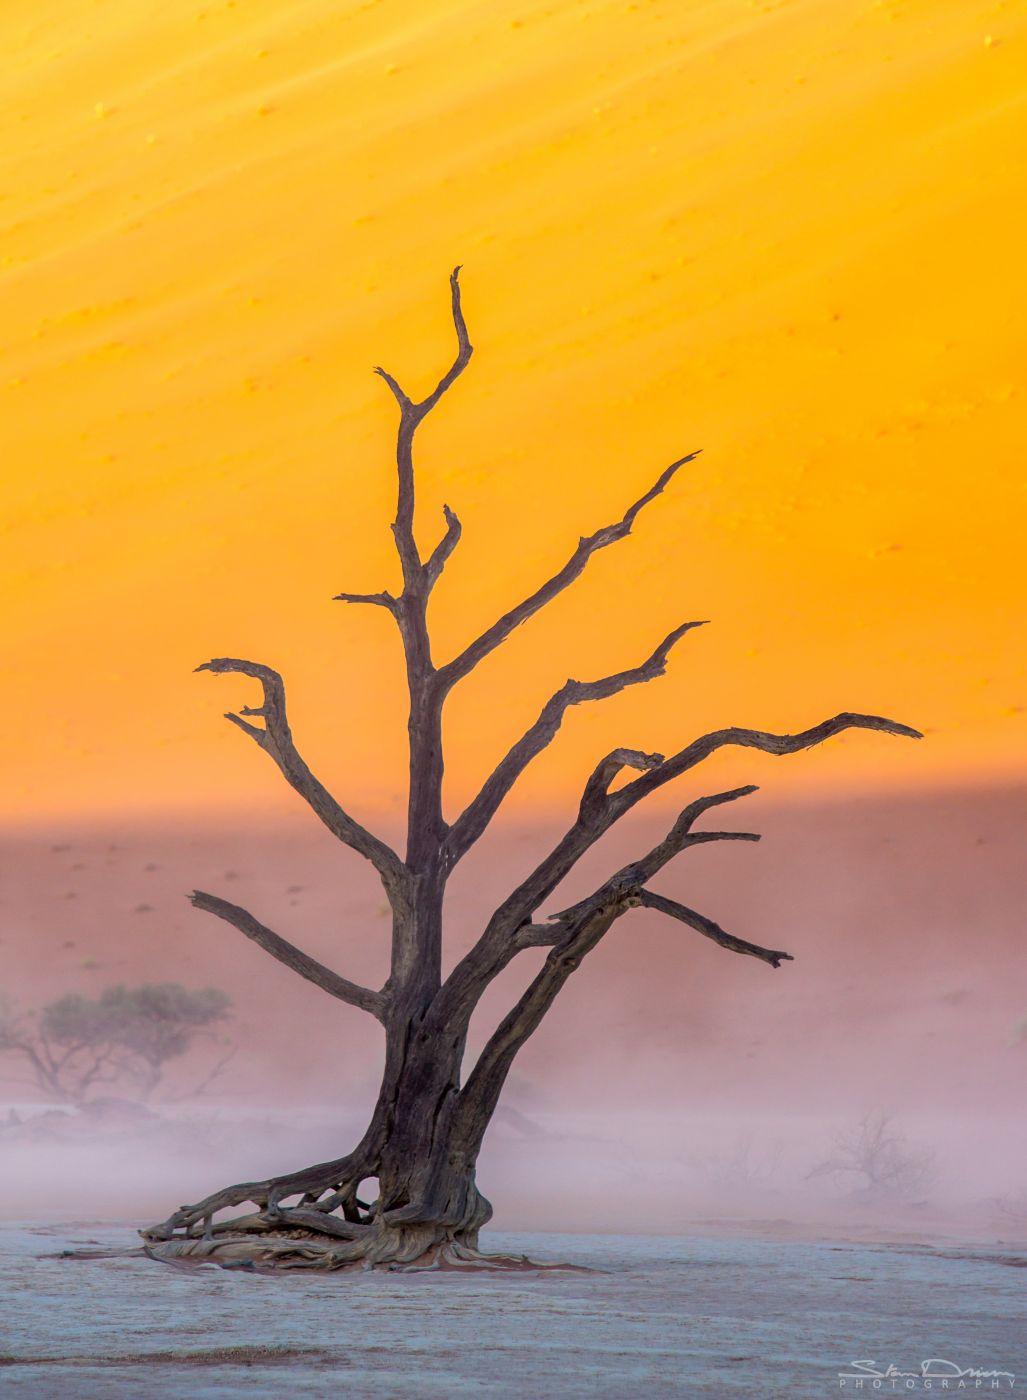 Deadvlei sandstorm, Namibia